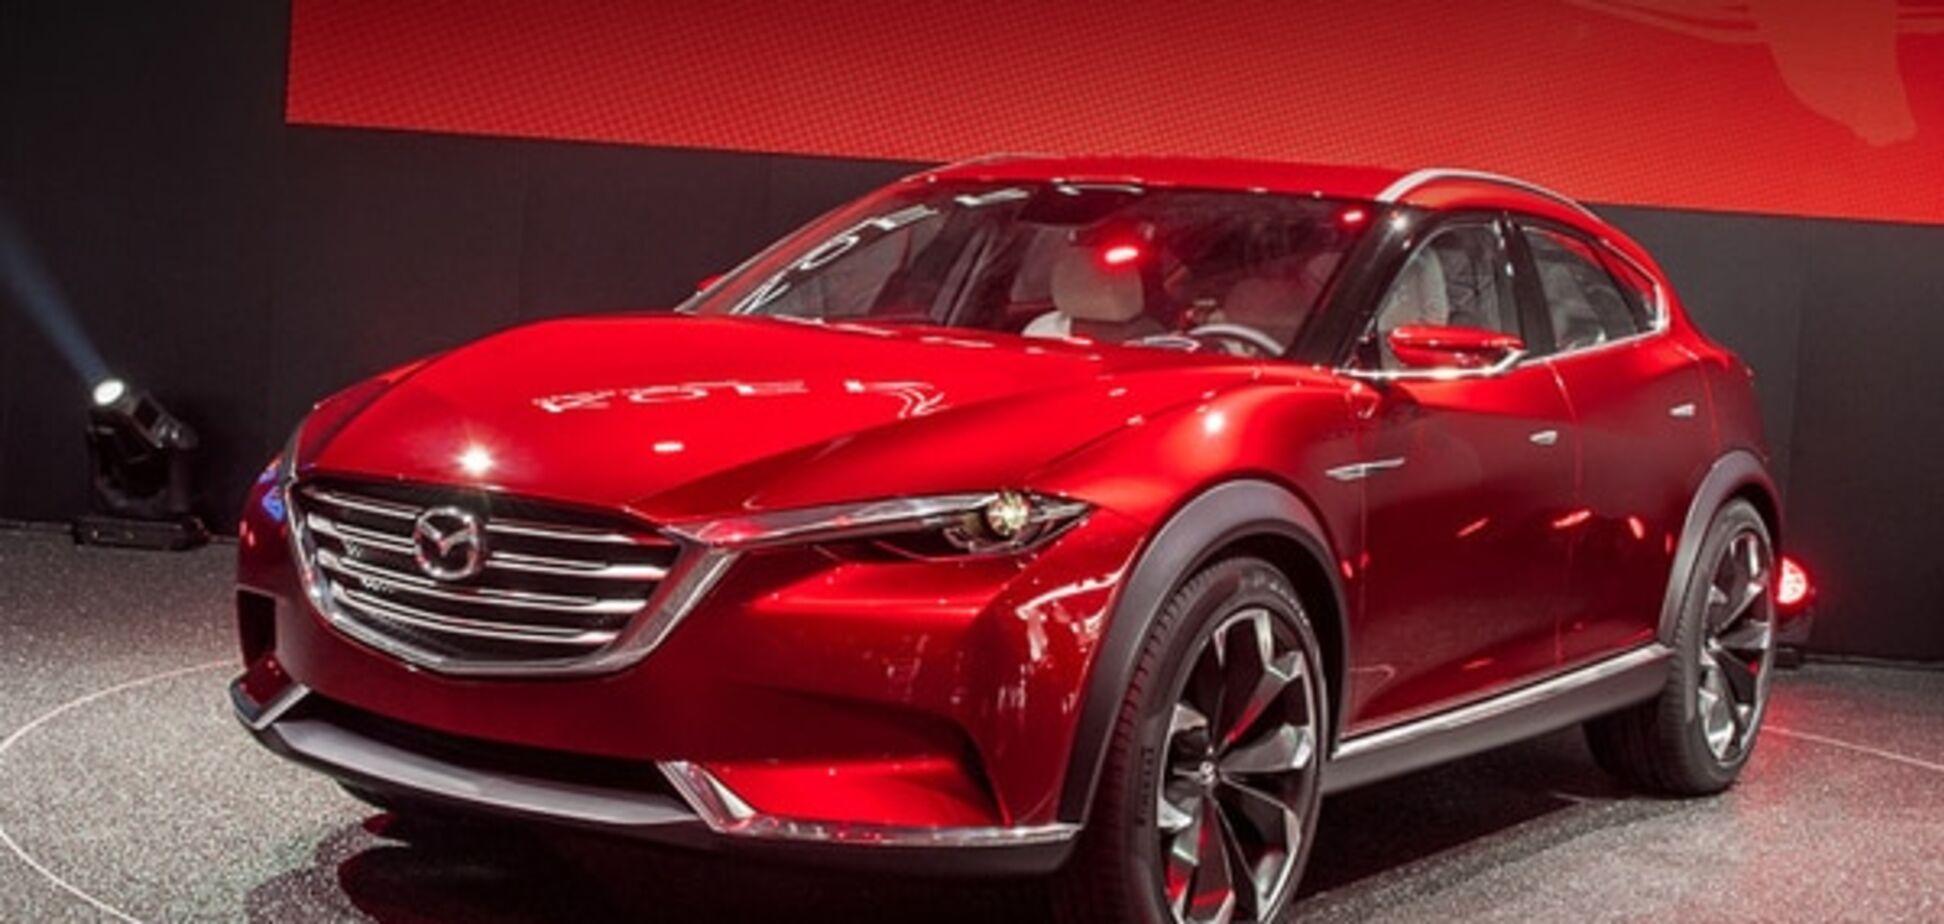 Франкфуртский автосалон: будущую Mazda CX-7 показали в виде концепта